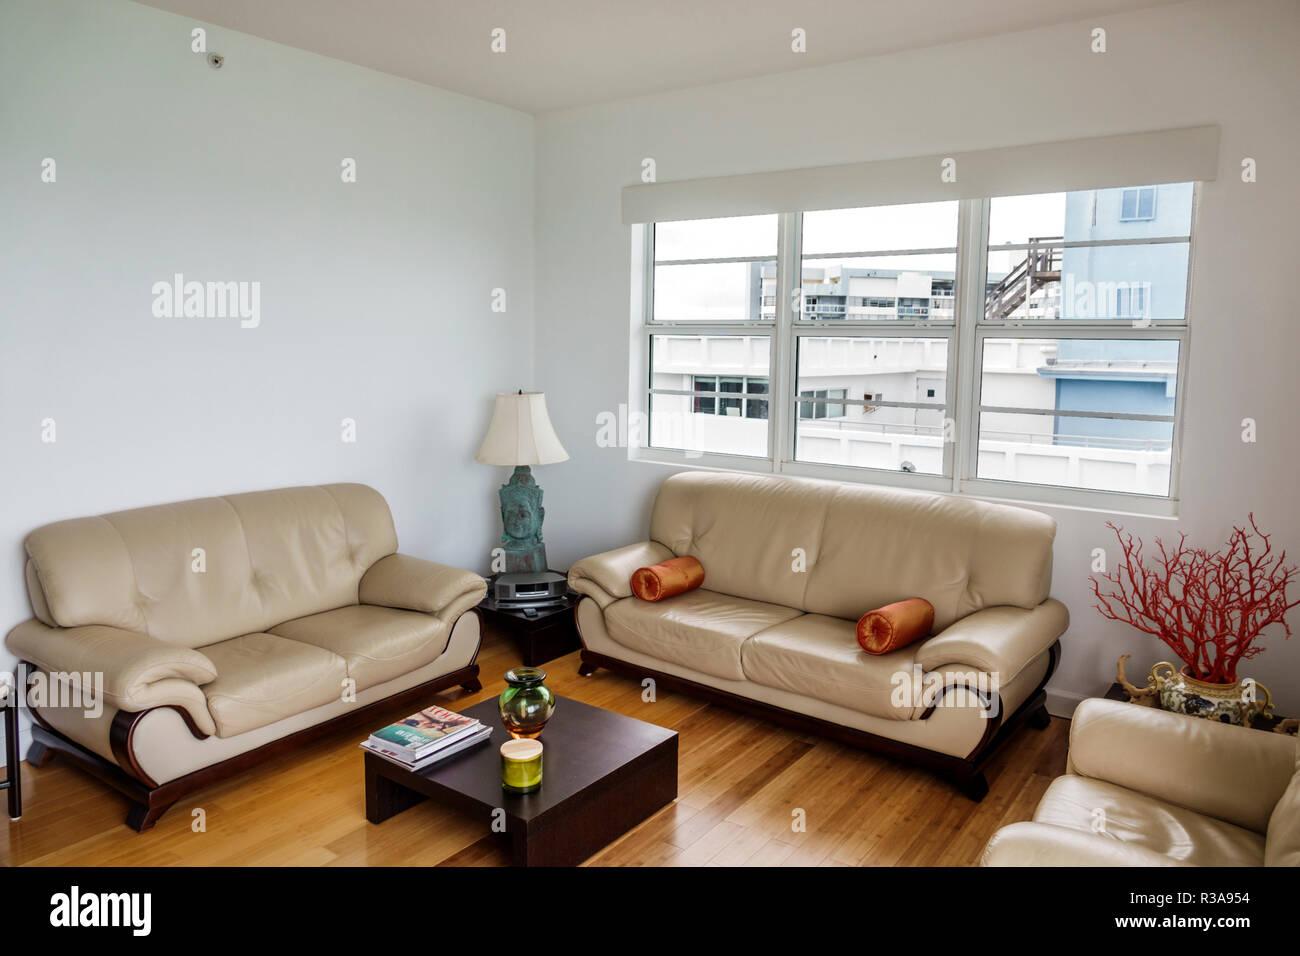 Miami Beach Florida North Beach Collins Condominium Condo Living